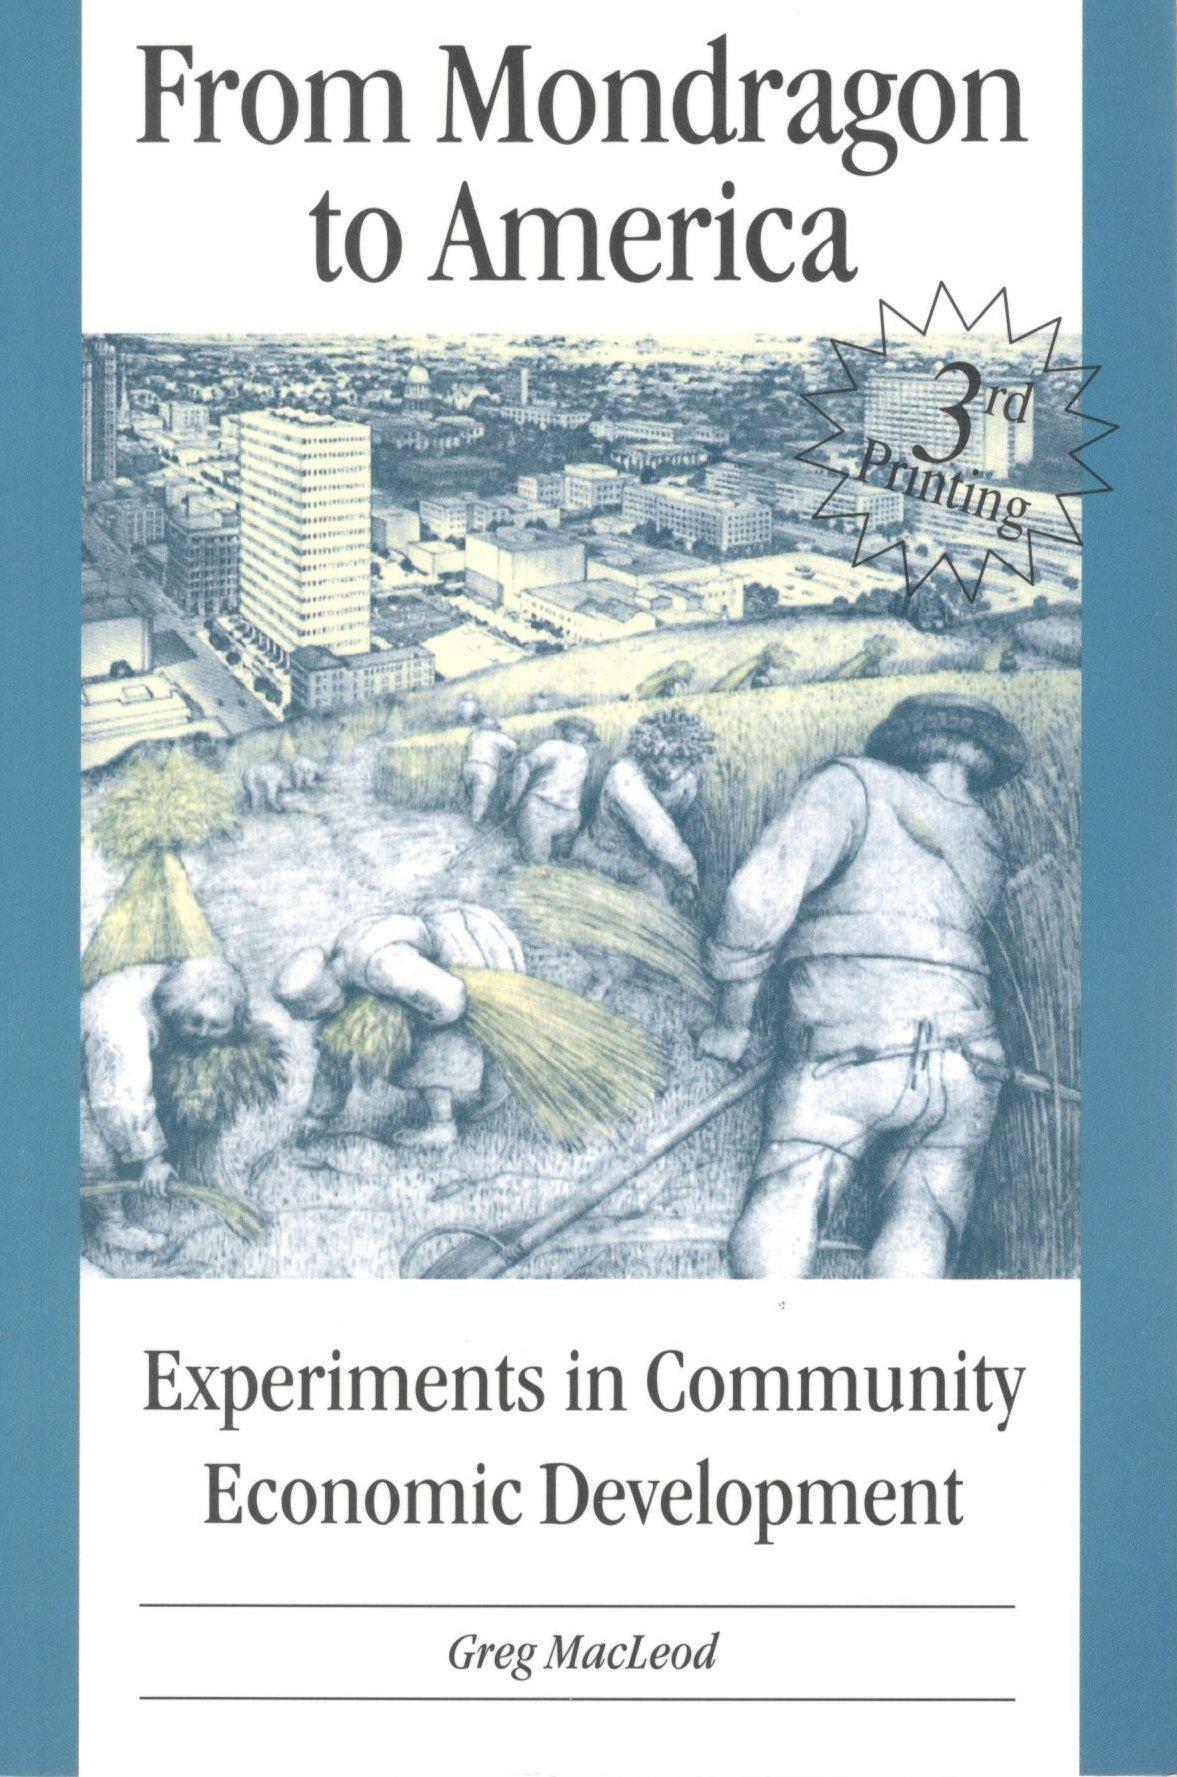 From Mondragon to America: Experiments in Community Economic Development